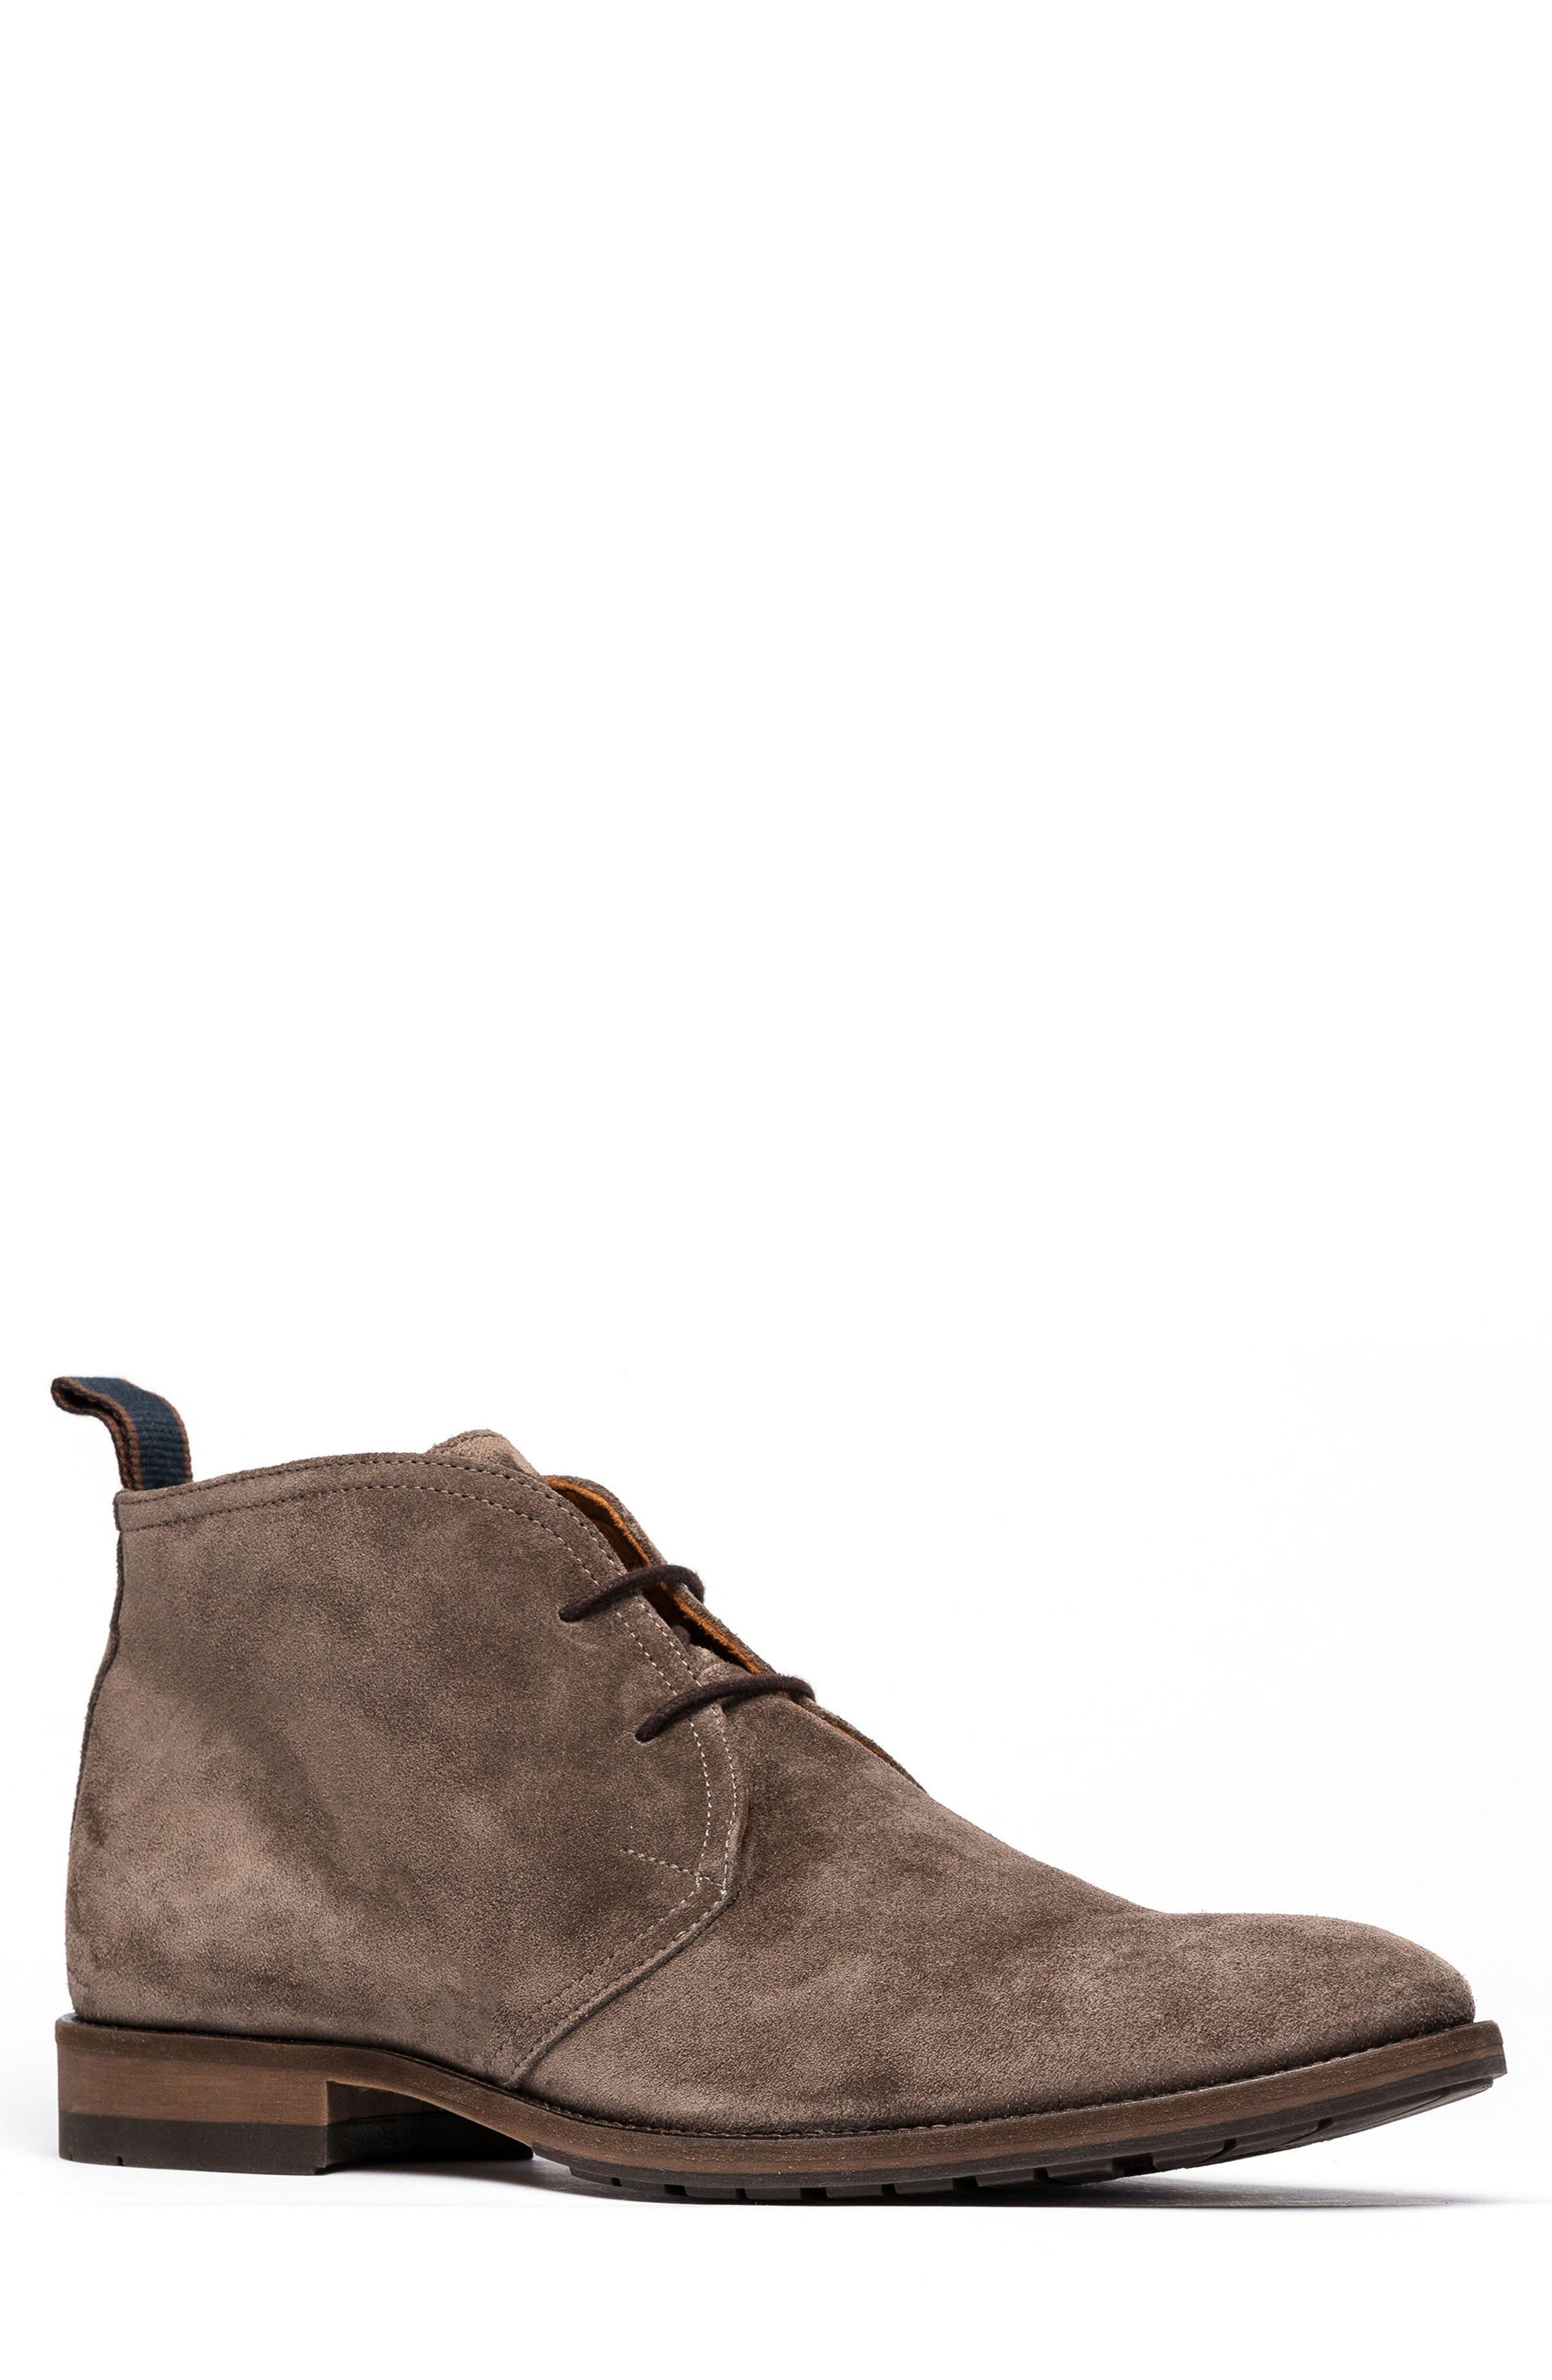 Pebbly Hill Chukka Boot,                         Main,                         color, TAUPE